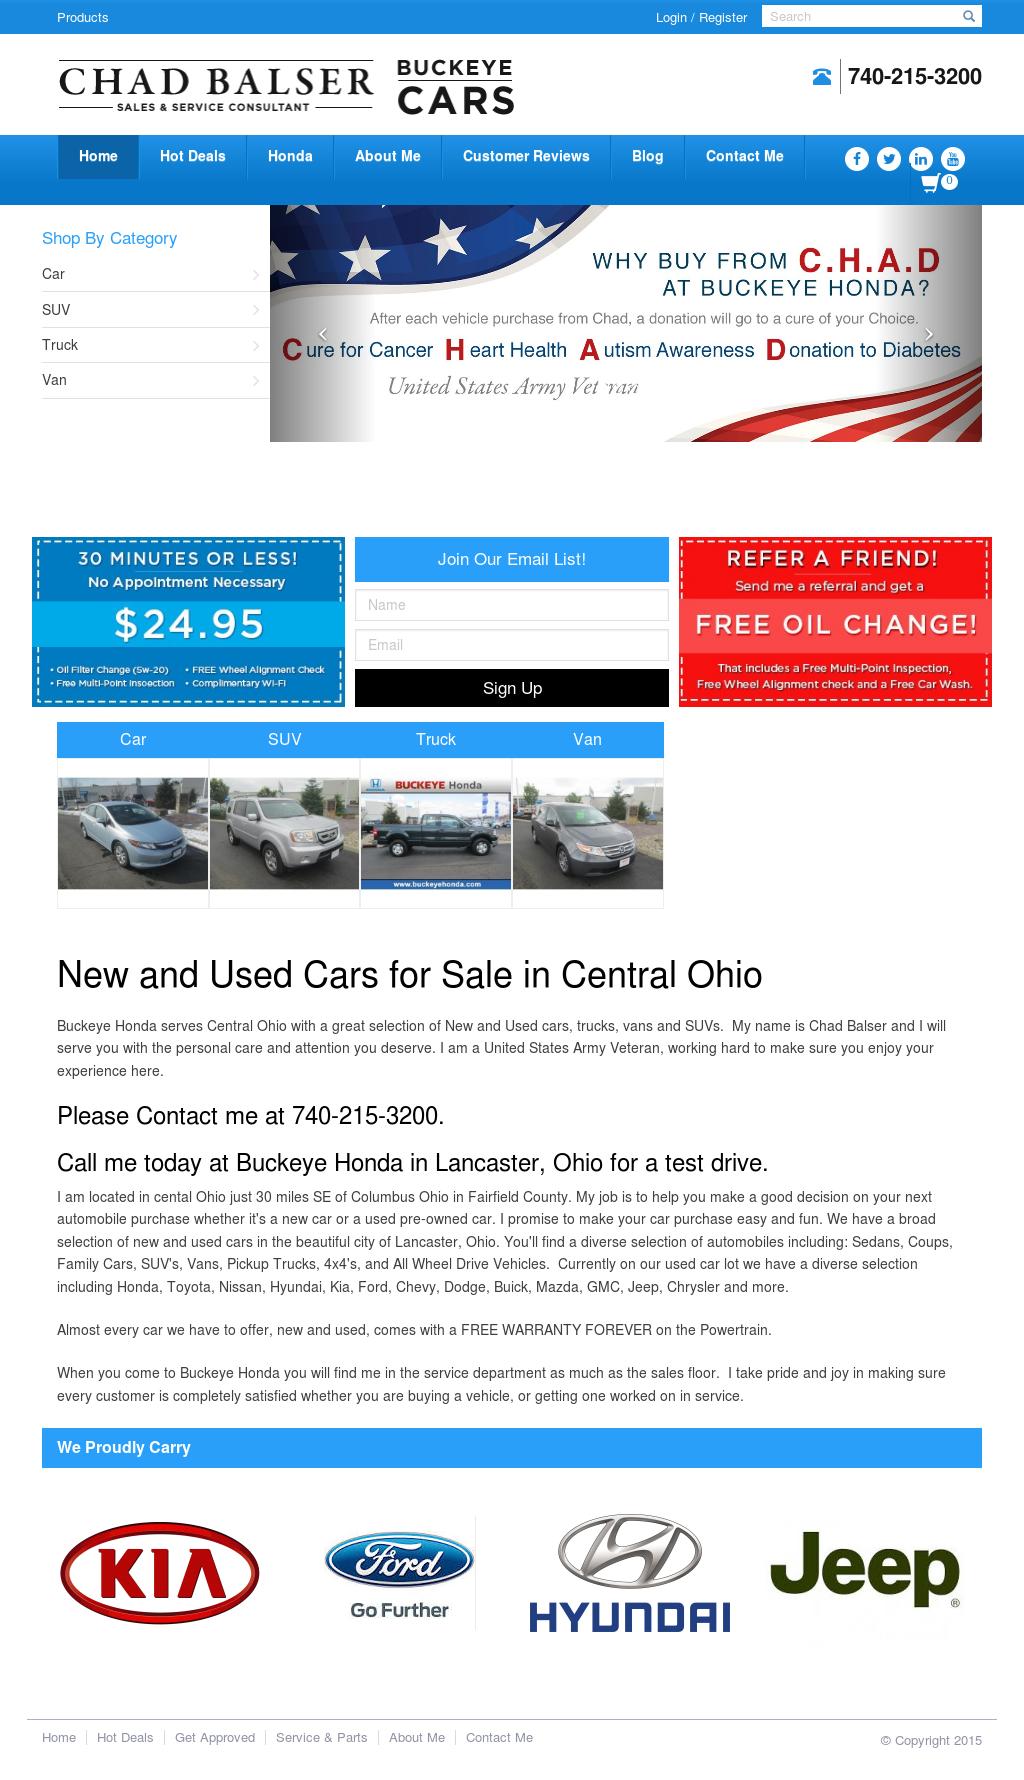 Amazing Buckeye Honda Sales U0026 Service, Chad Balser Competitors, Revenue And  Employees   Owler Company Profile